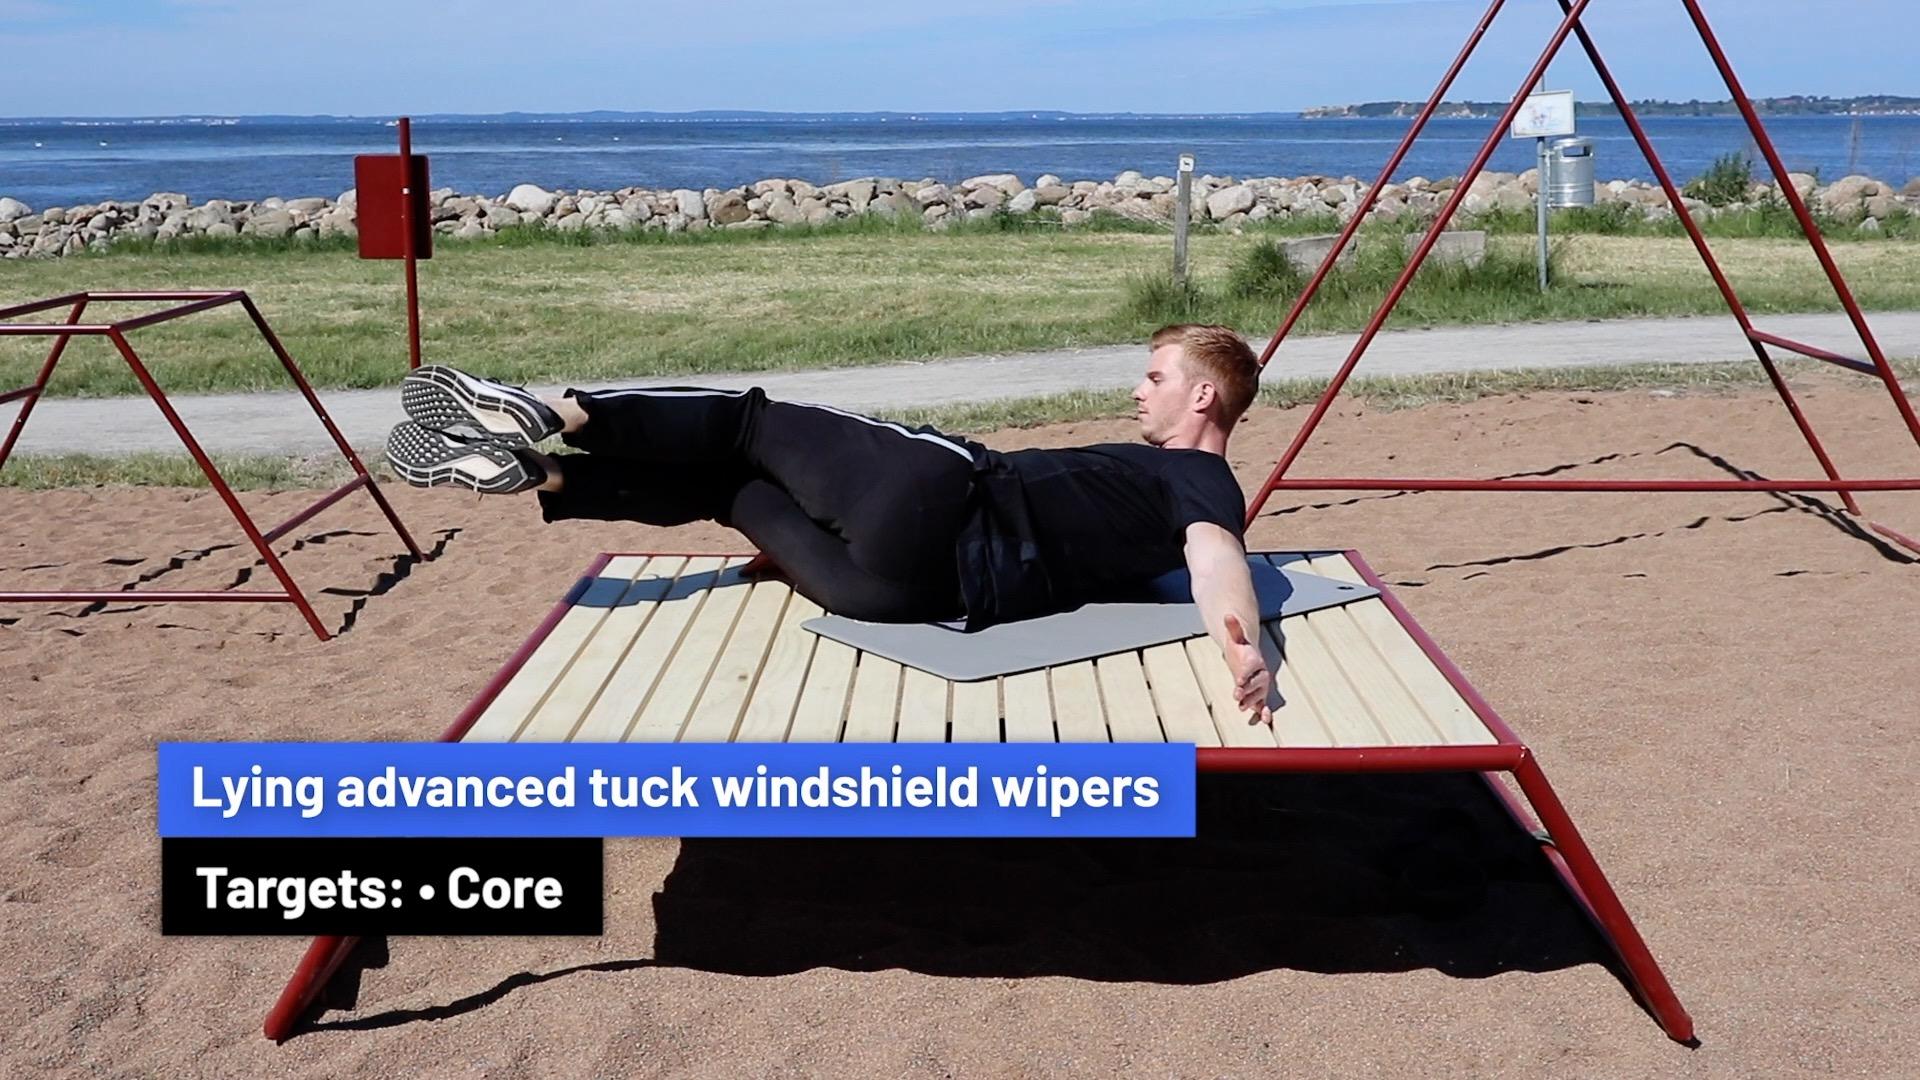 Lying advanced tuck windshield wipers